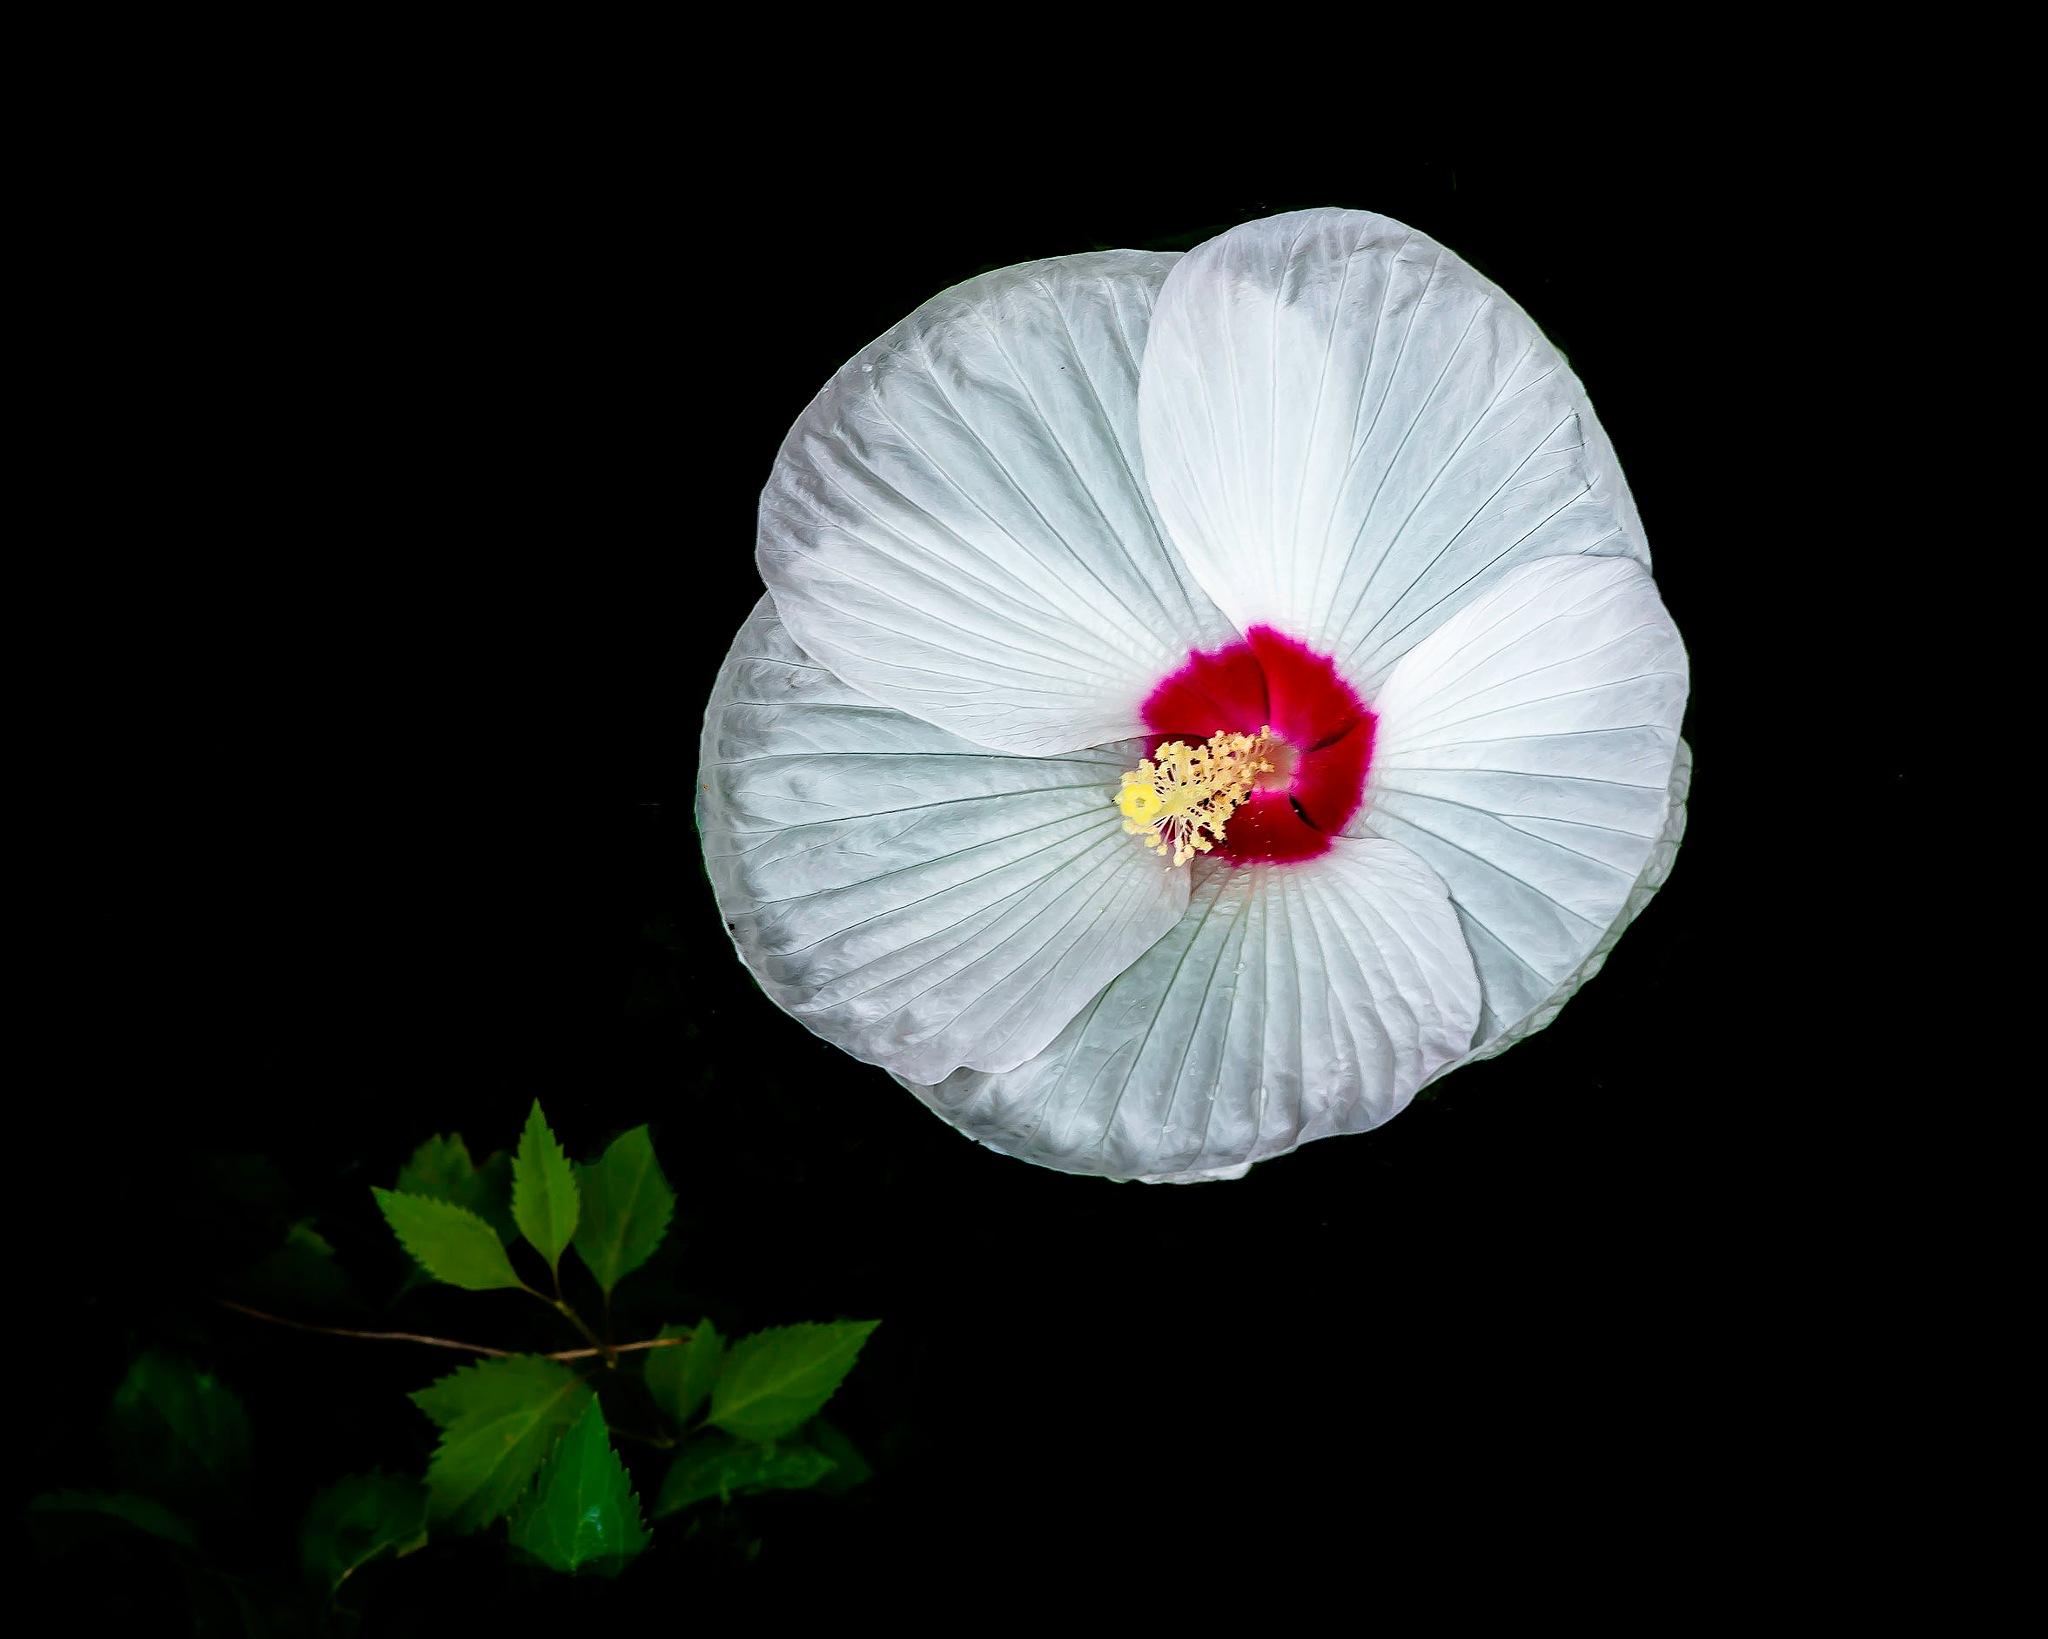 Moon Flower by Edward Brown